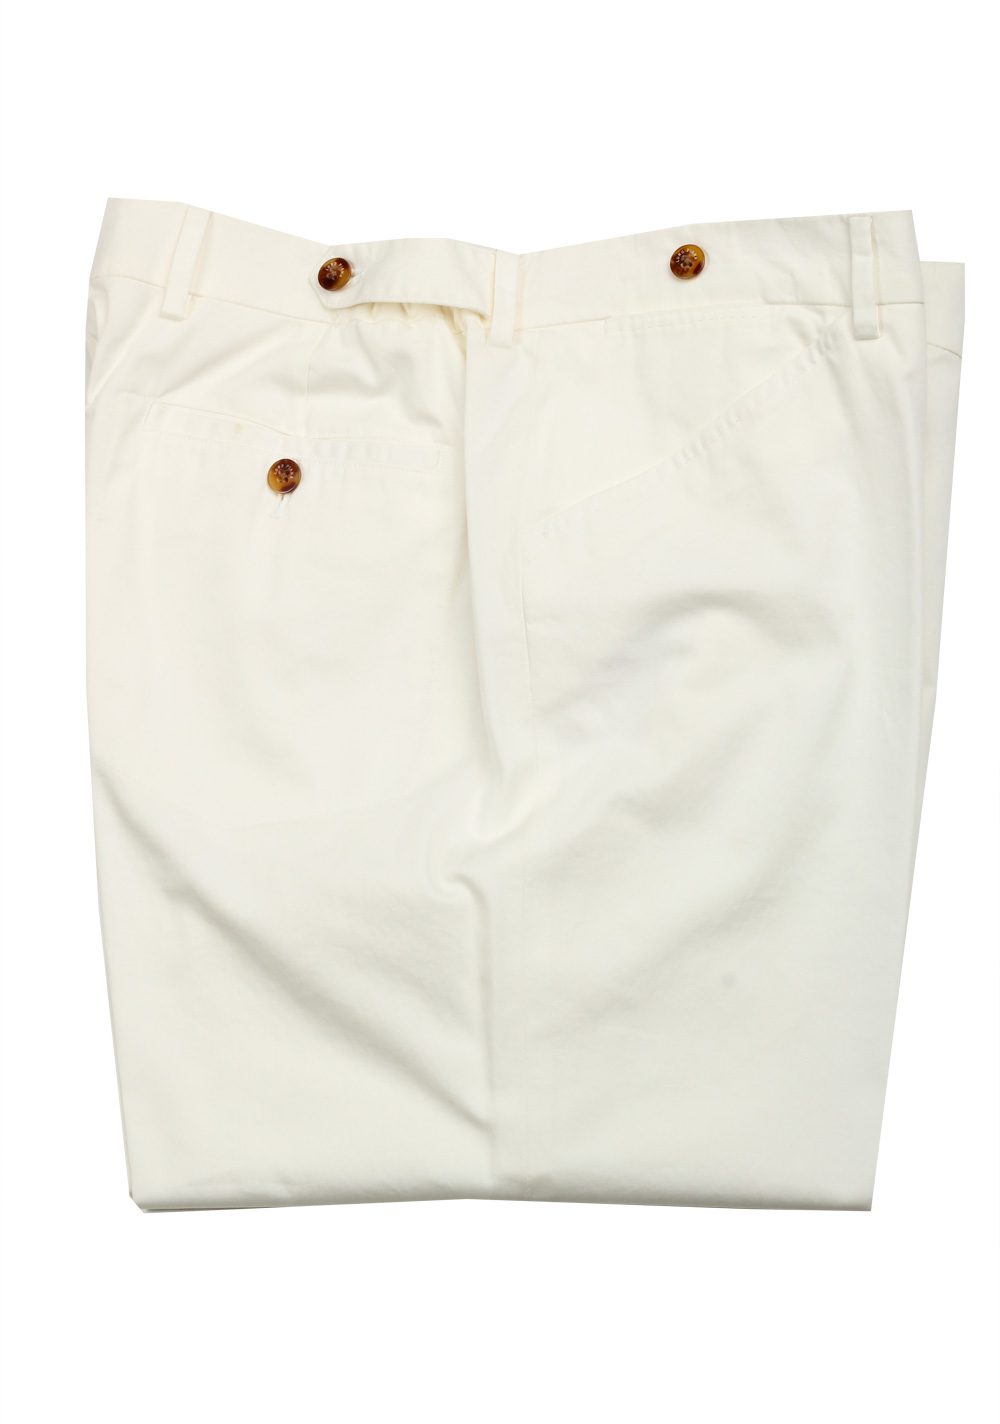 Loro Piana Off White Trousers Size 56 / 40 U.S. | Costume Limité